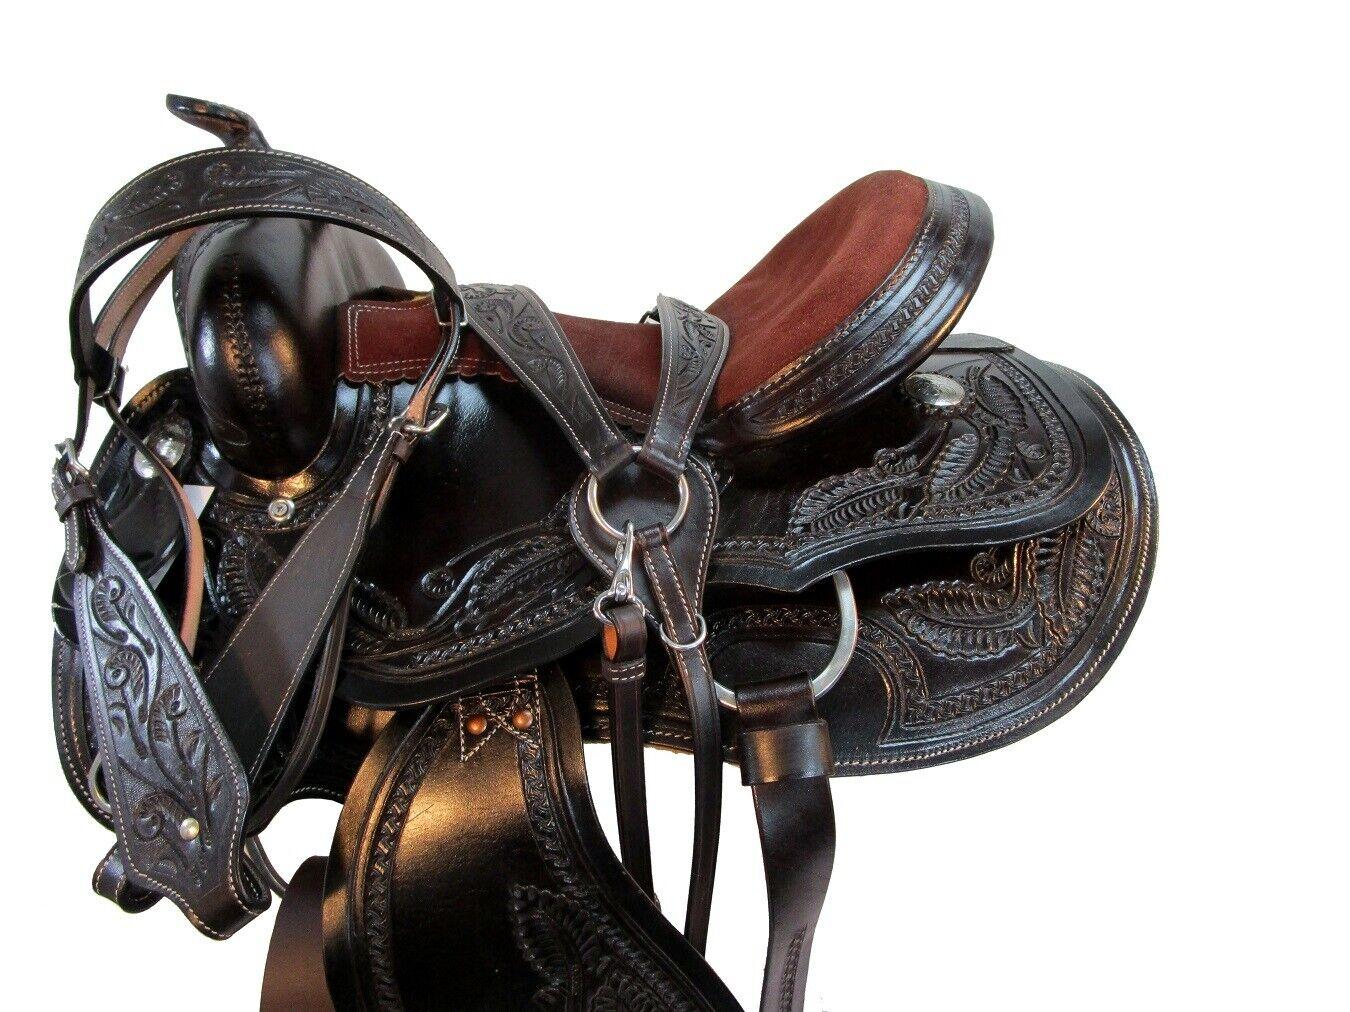 WESTERN COWBOY SADDLE BARREL RACING 15 16 17 PLEASURE HORSE